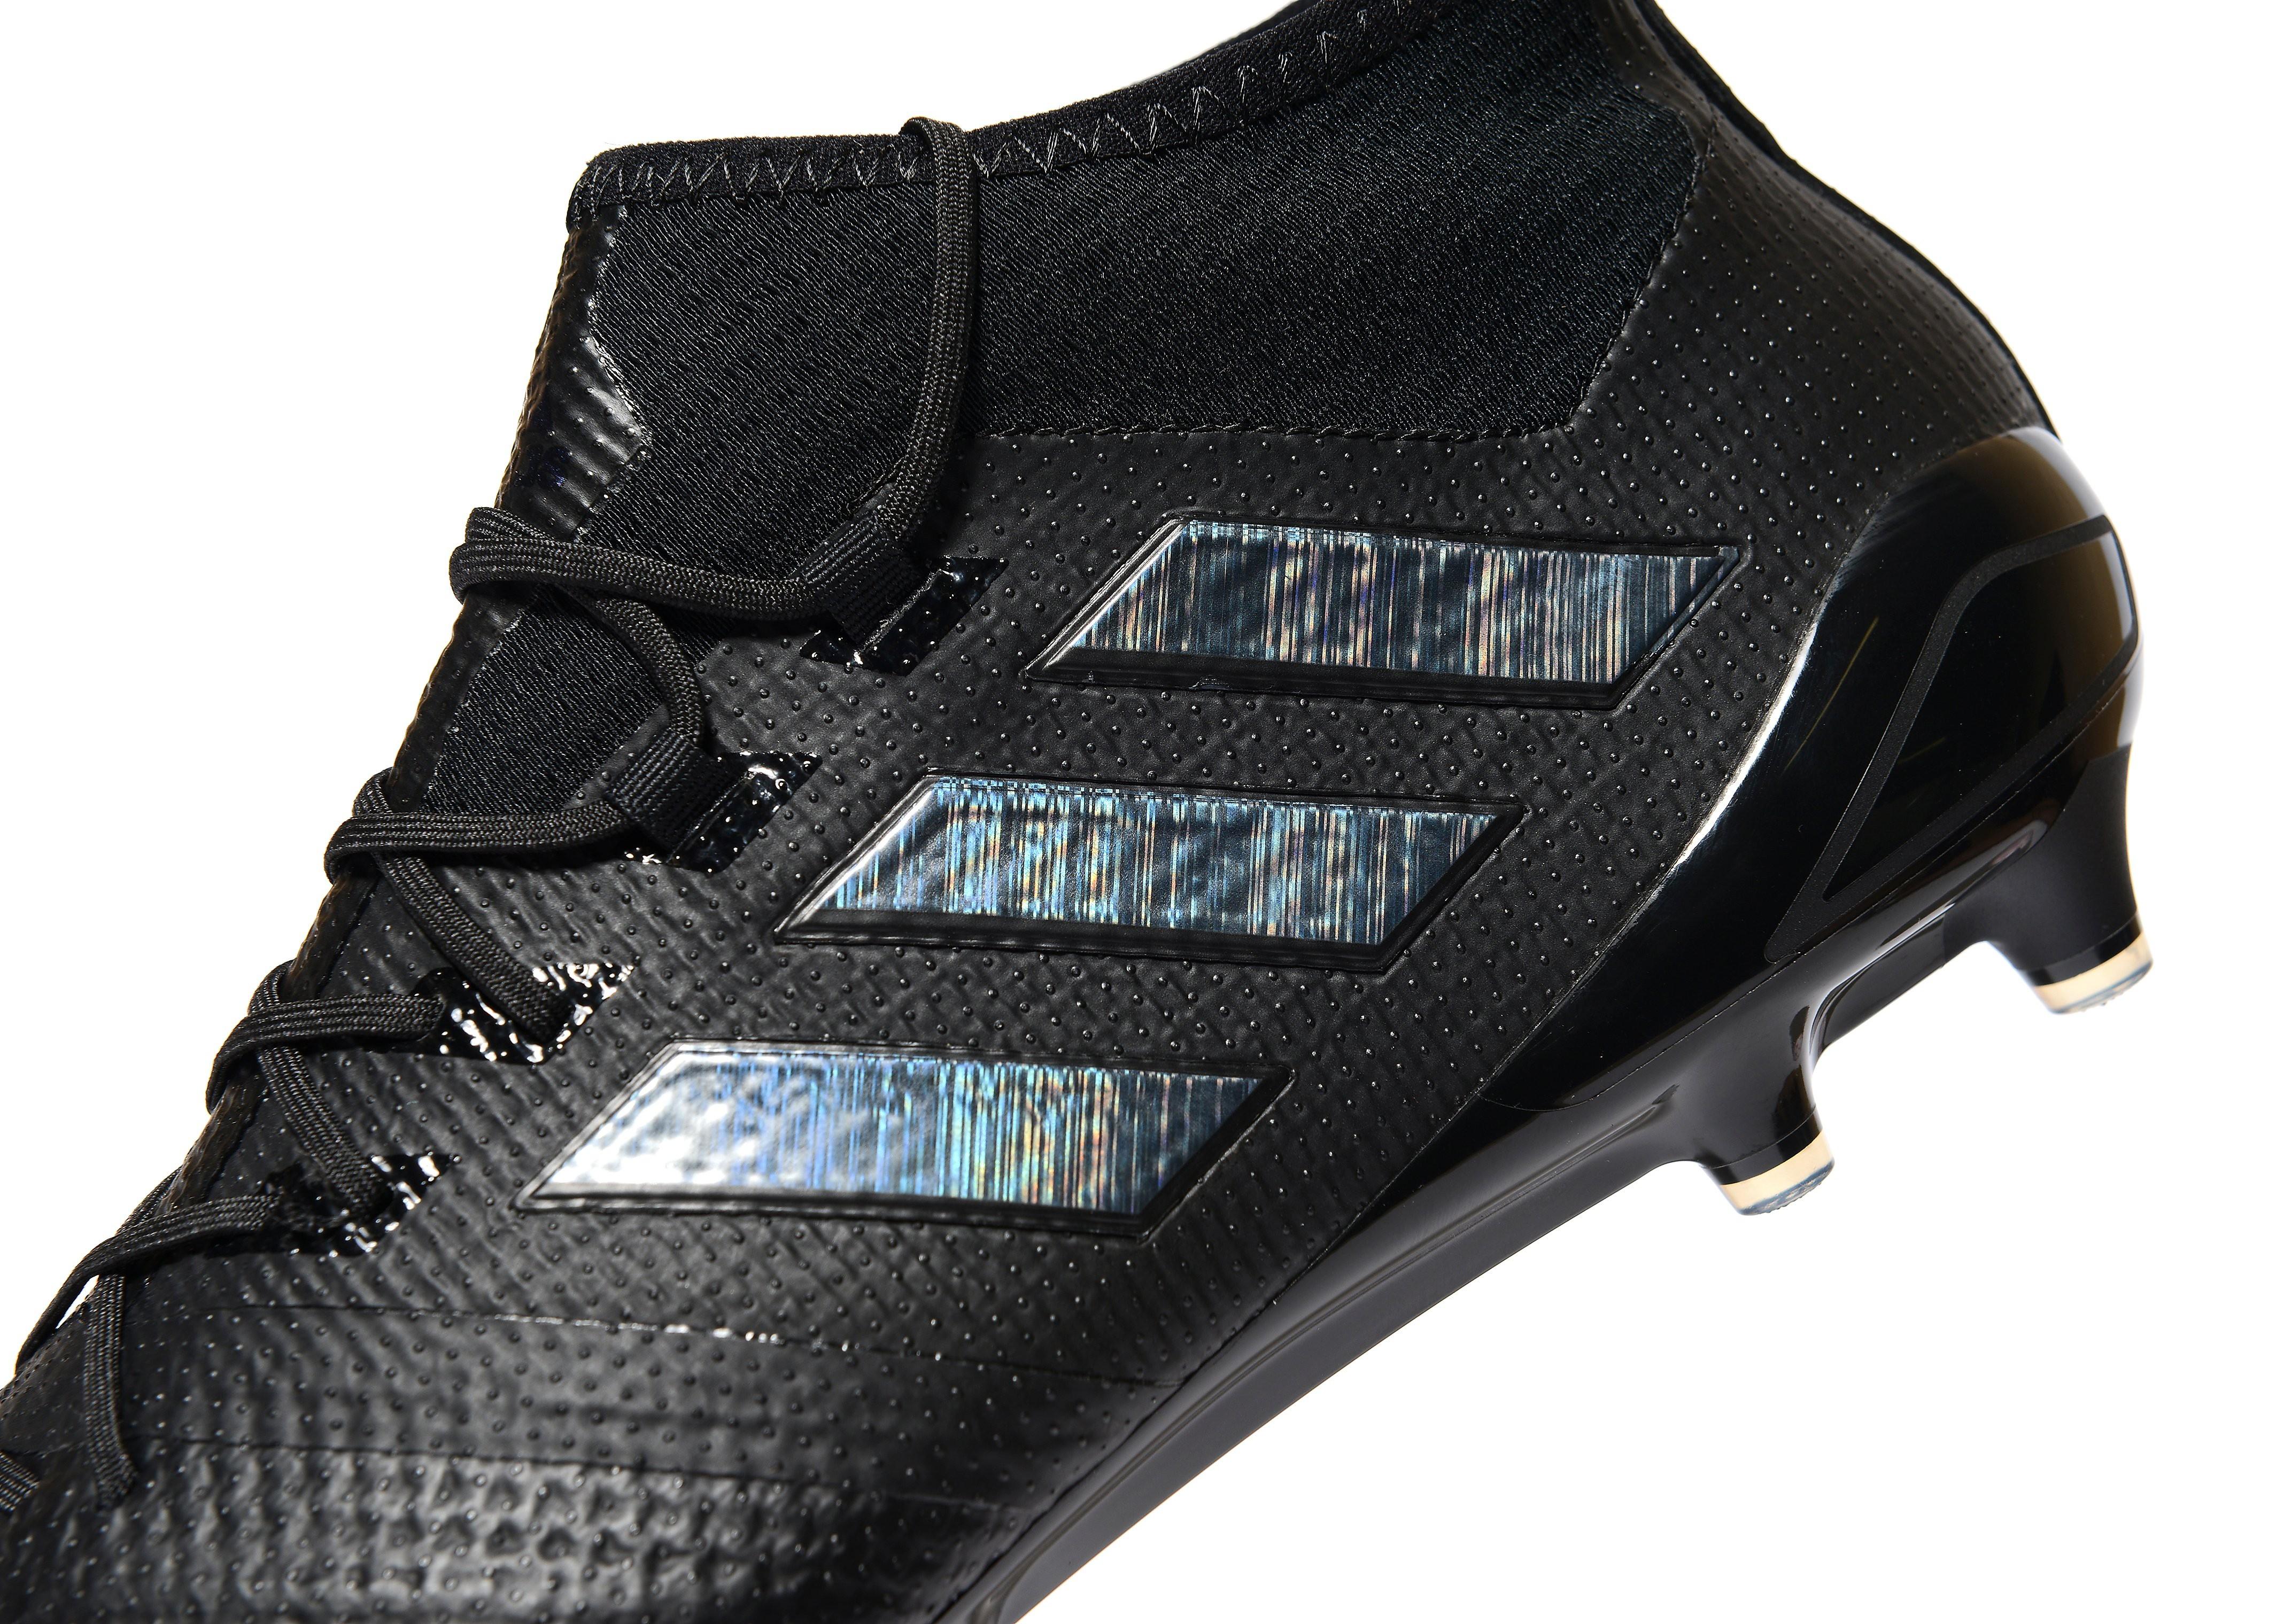 adidas Magnetic Storm ACE 17.1 Primeknit FG